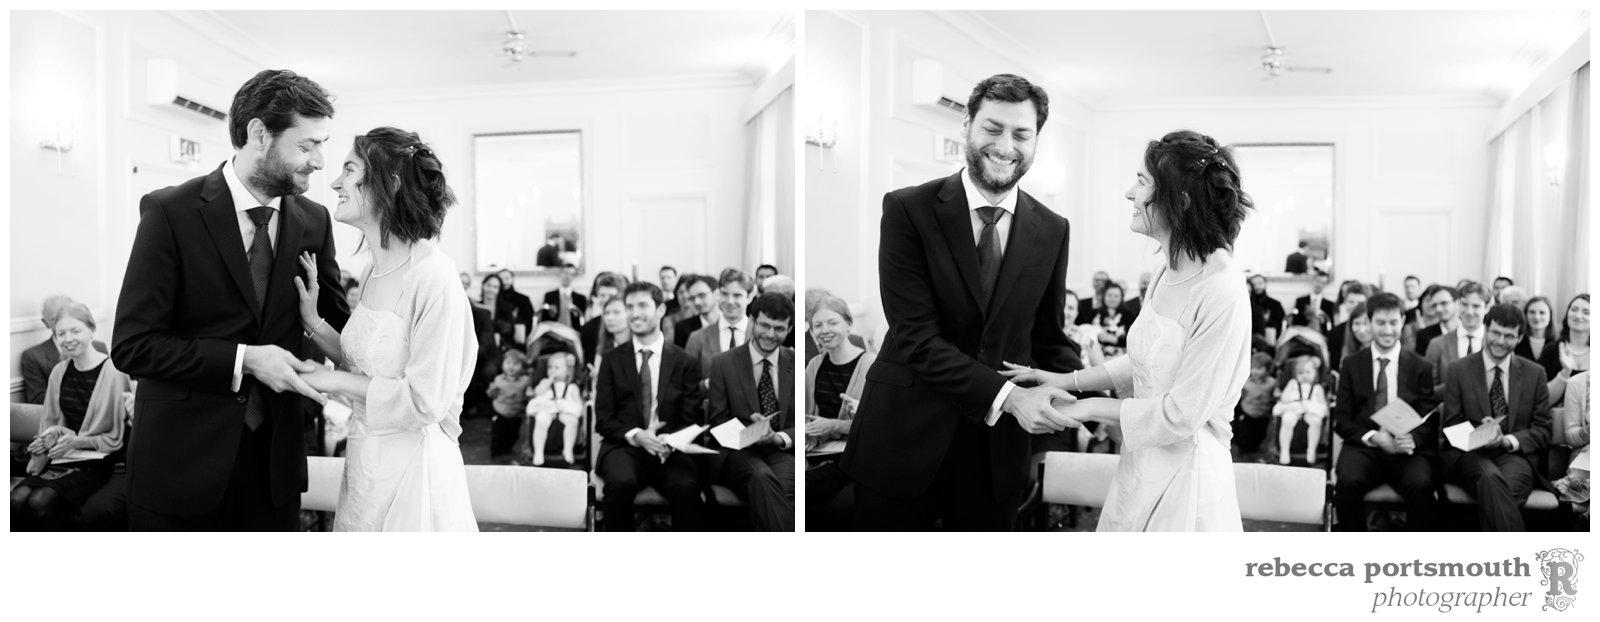 cambridge-register-office-wedding-08